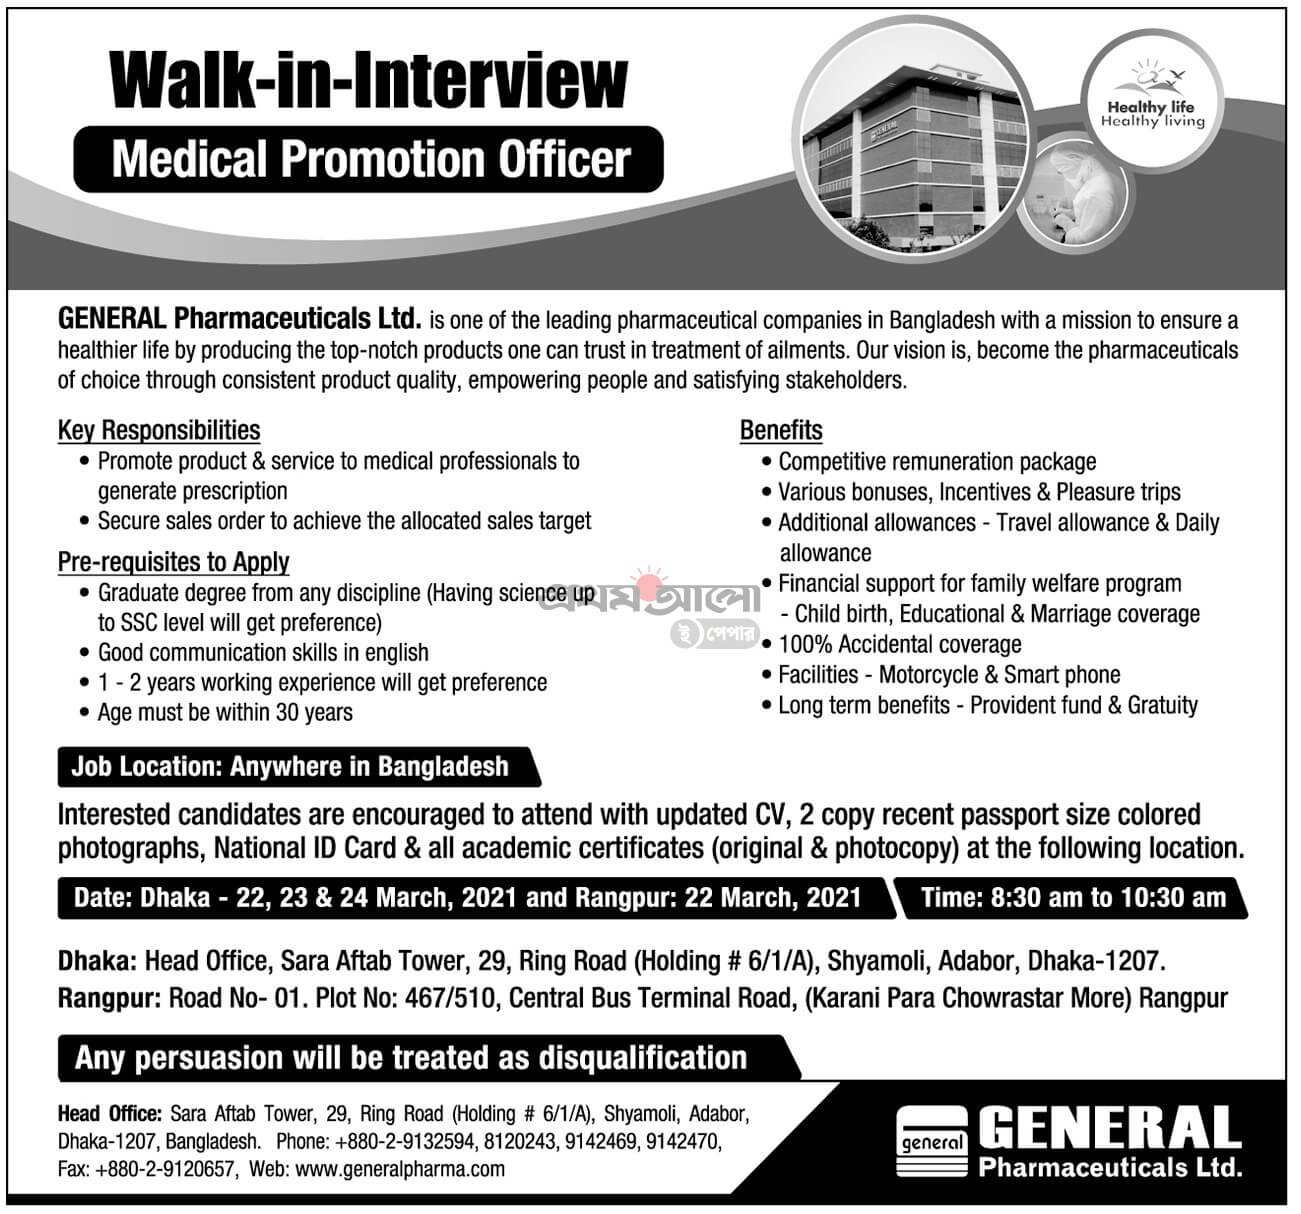 General Pharmaceuticals Ltd Job Circular